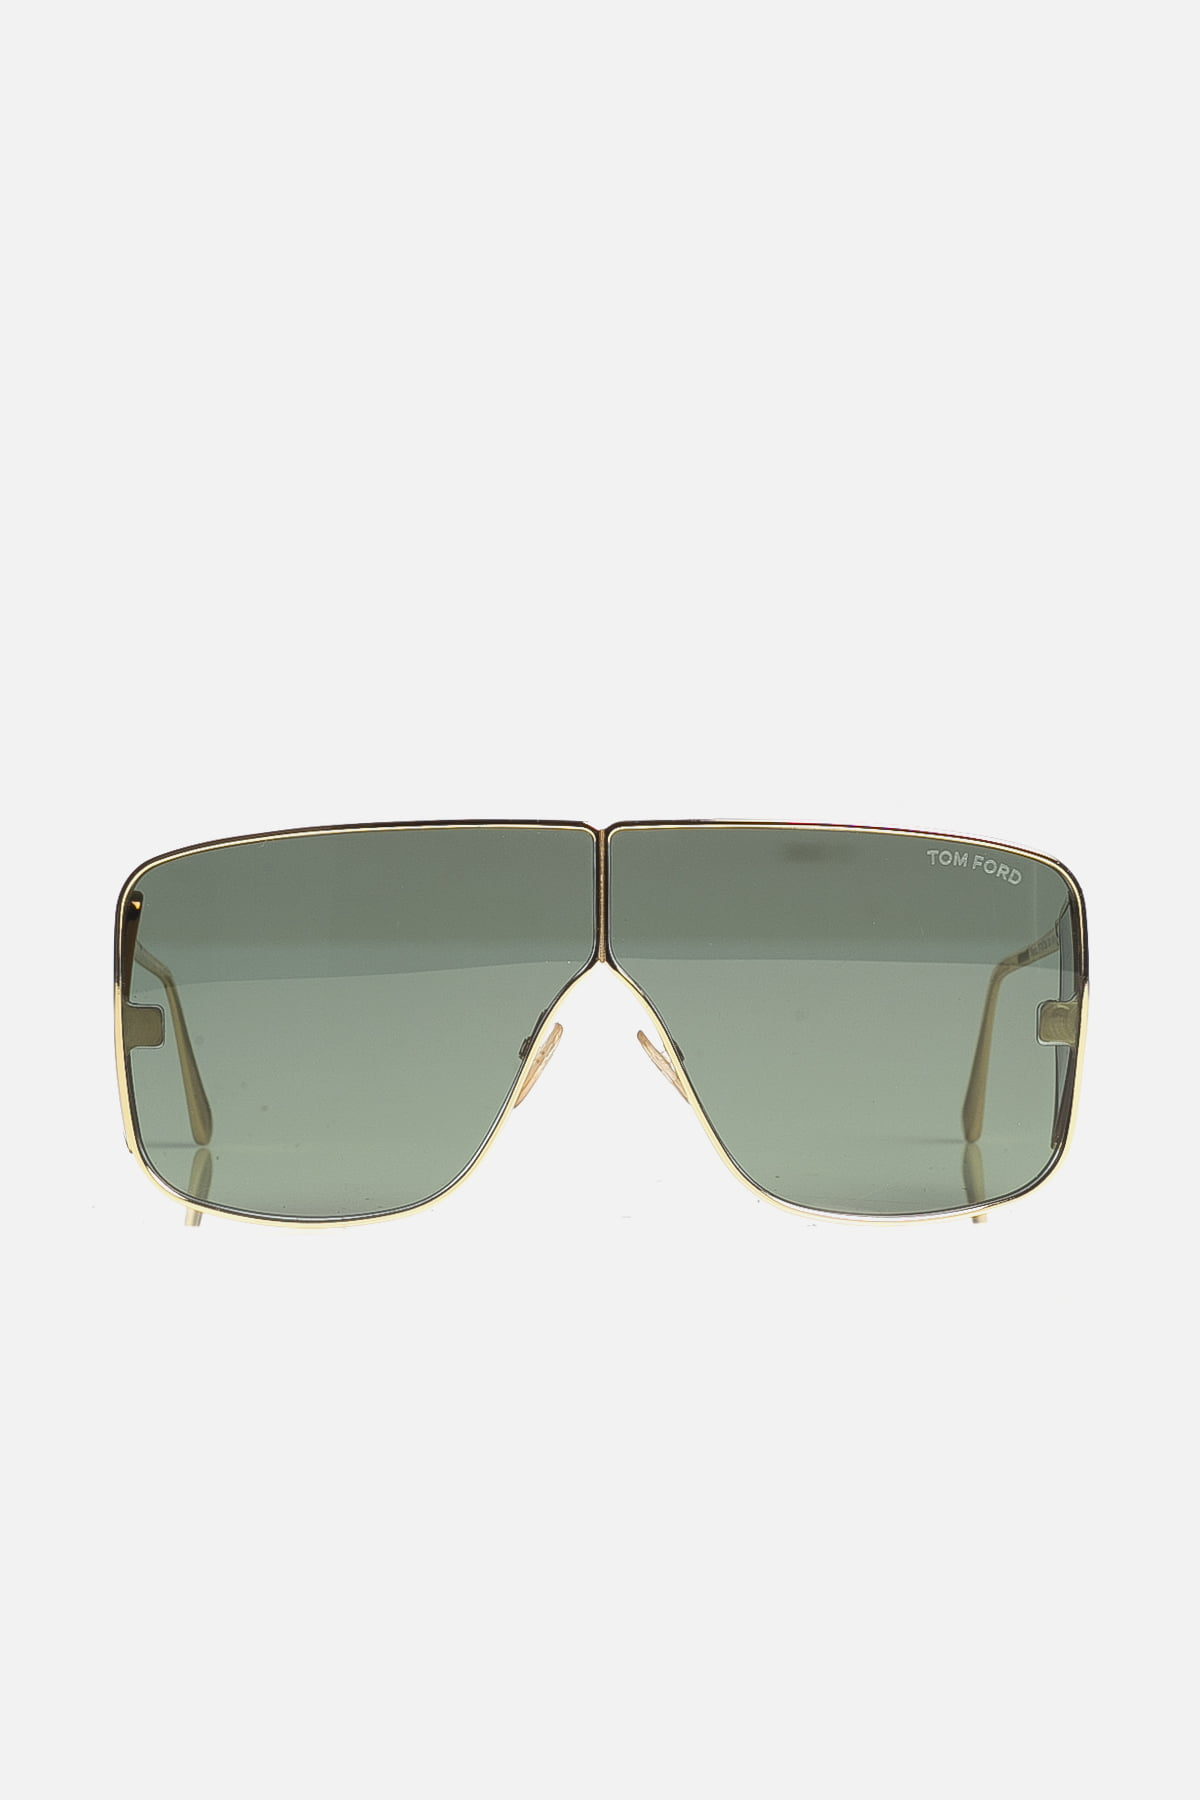 Tom Ford Spector Sunglasses REWAY 1